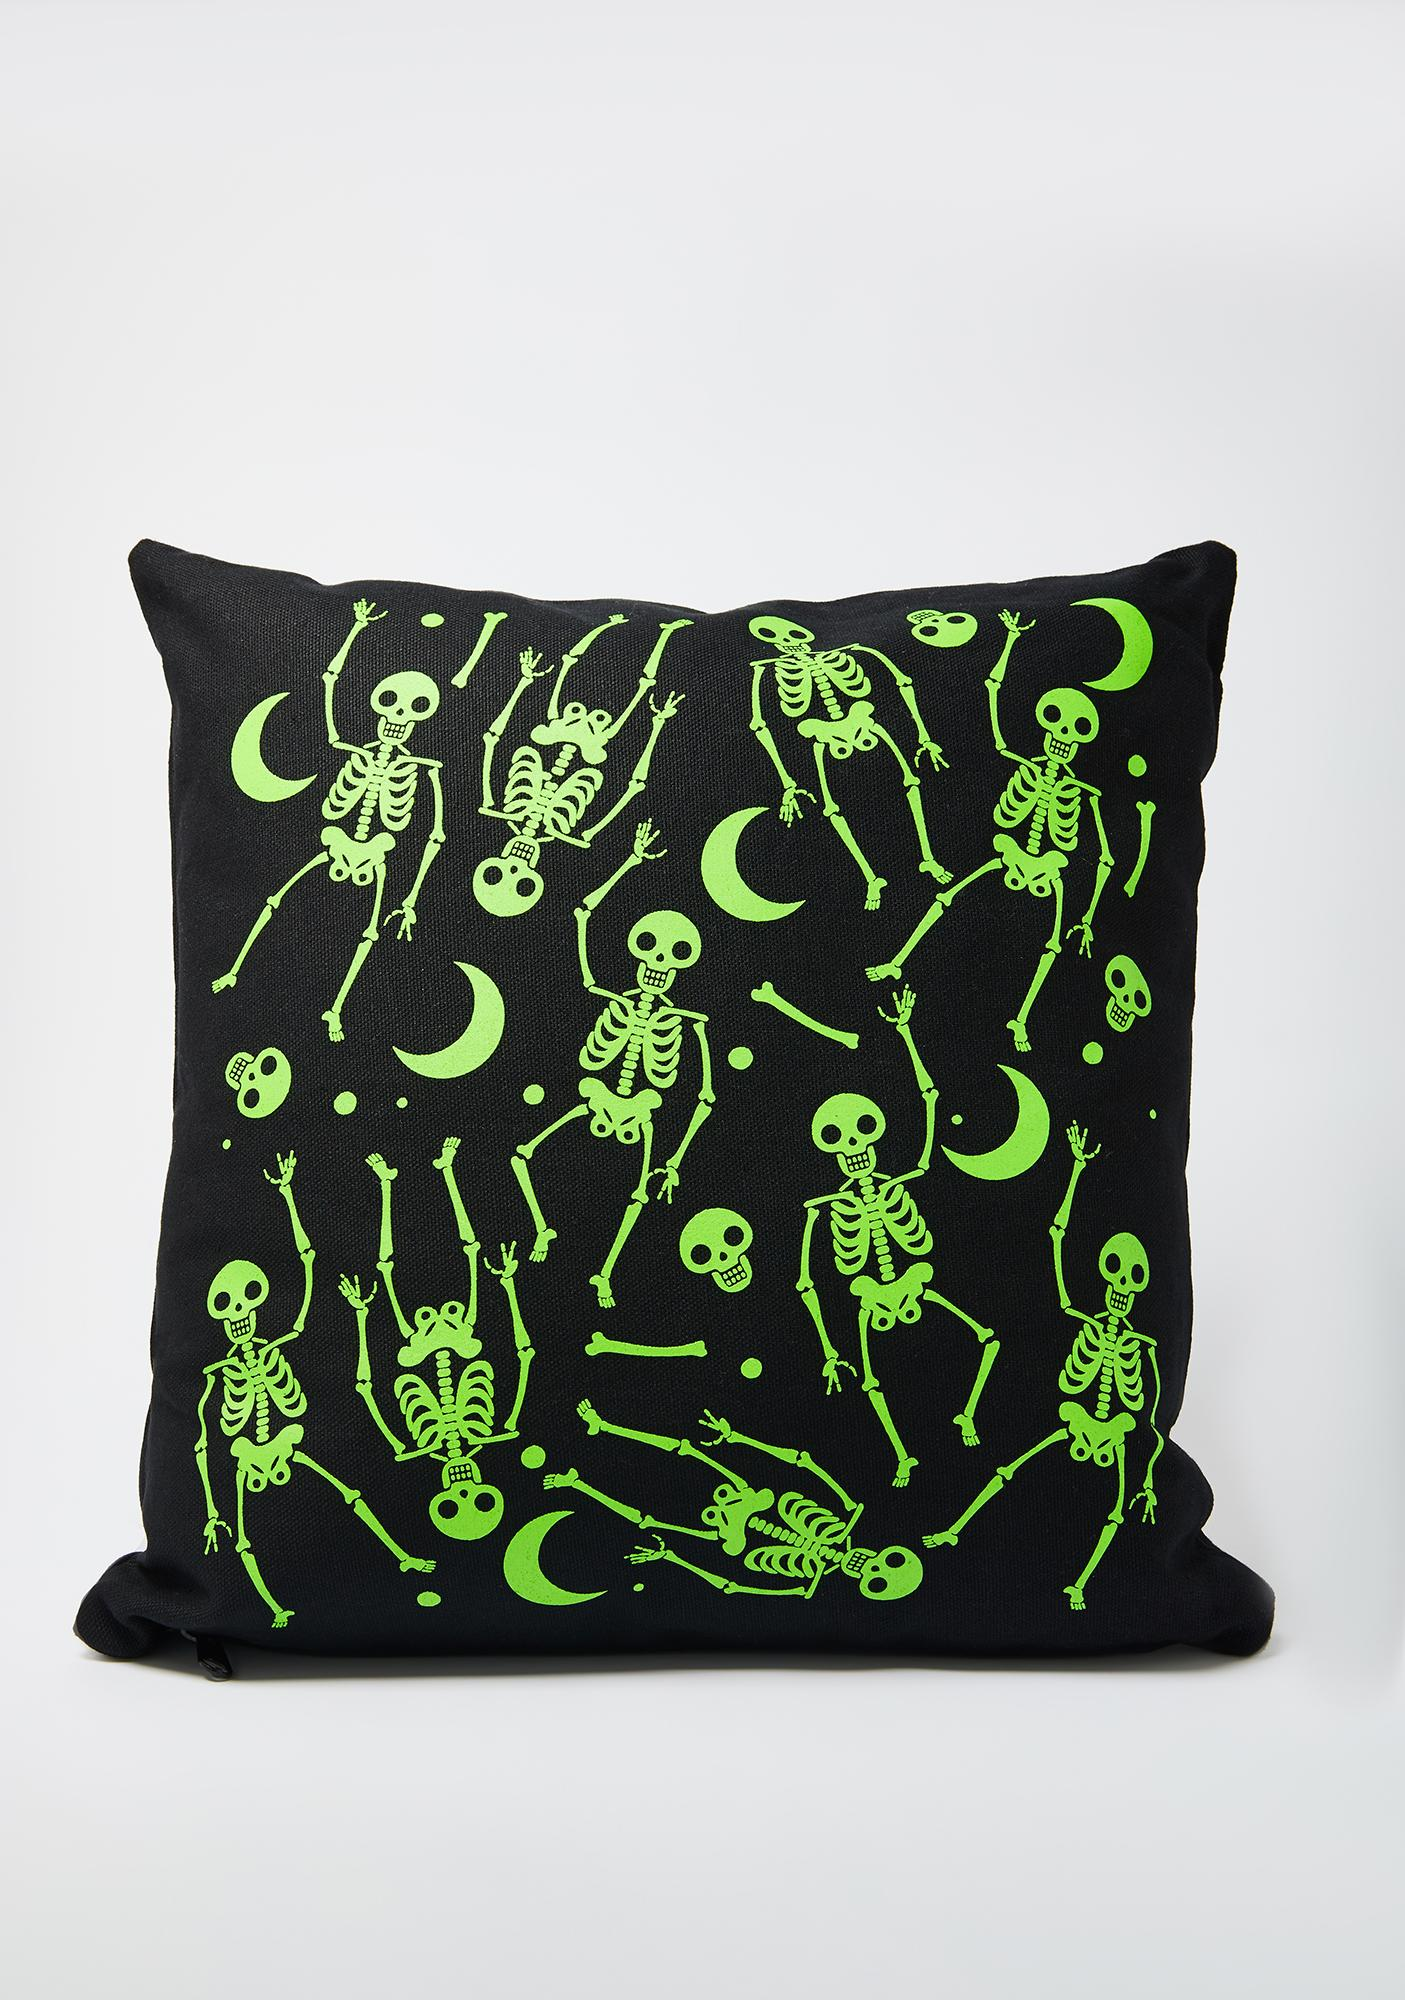 Femfetti Green Skeleton Pattern Pillow